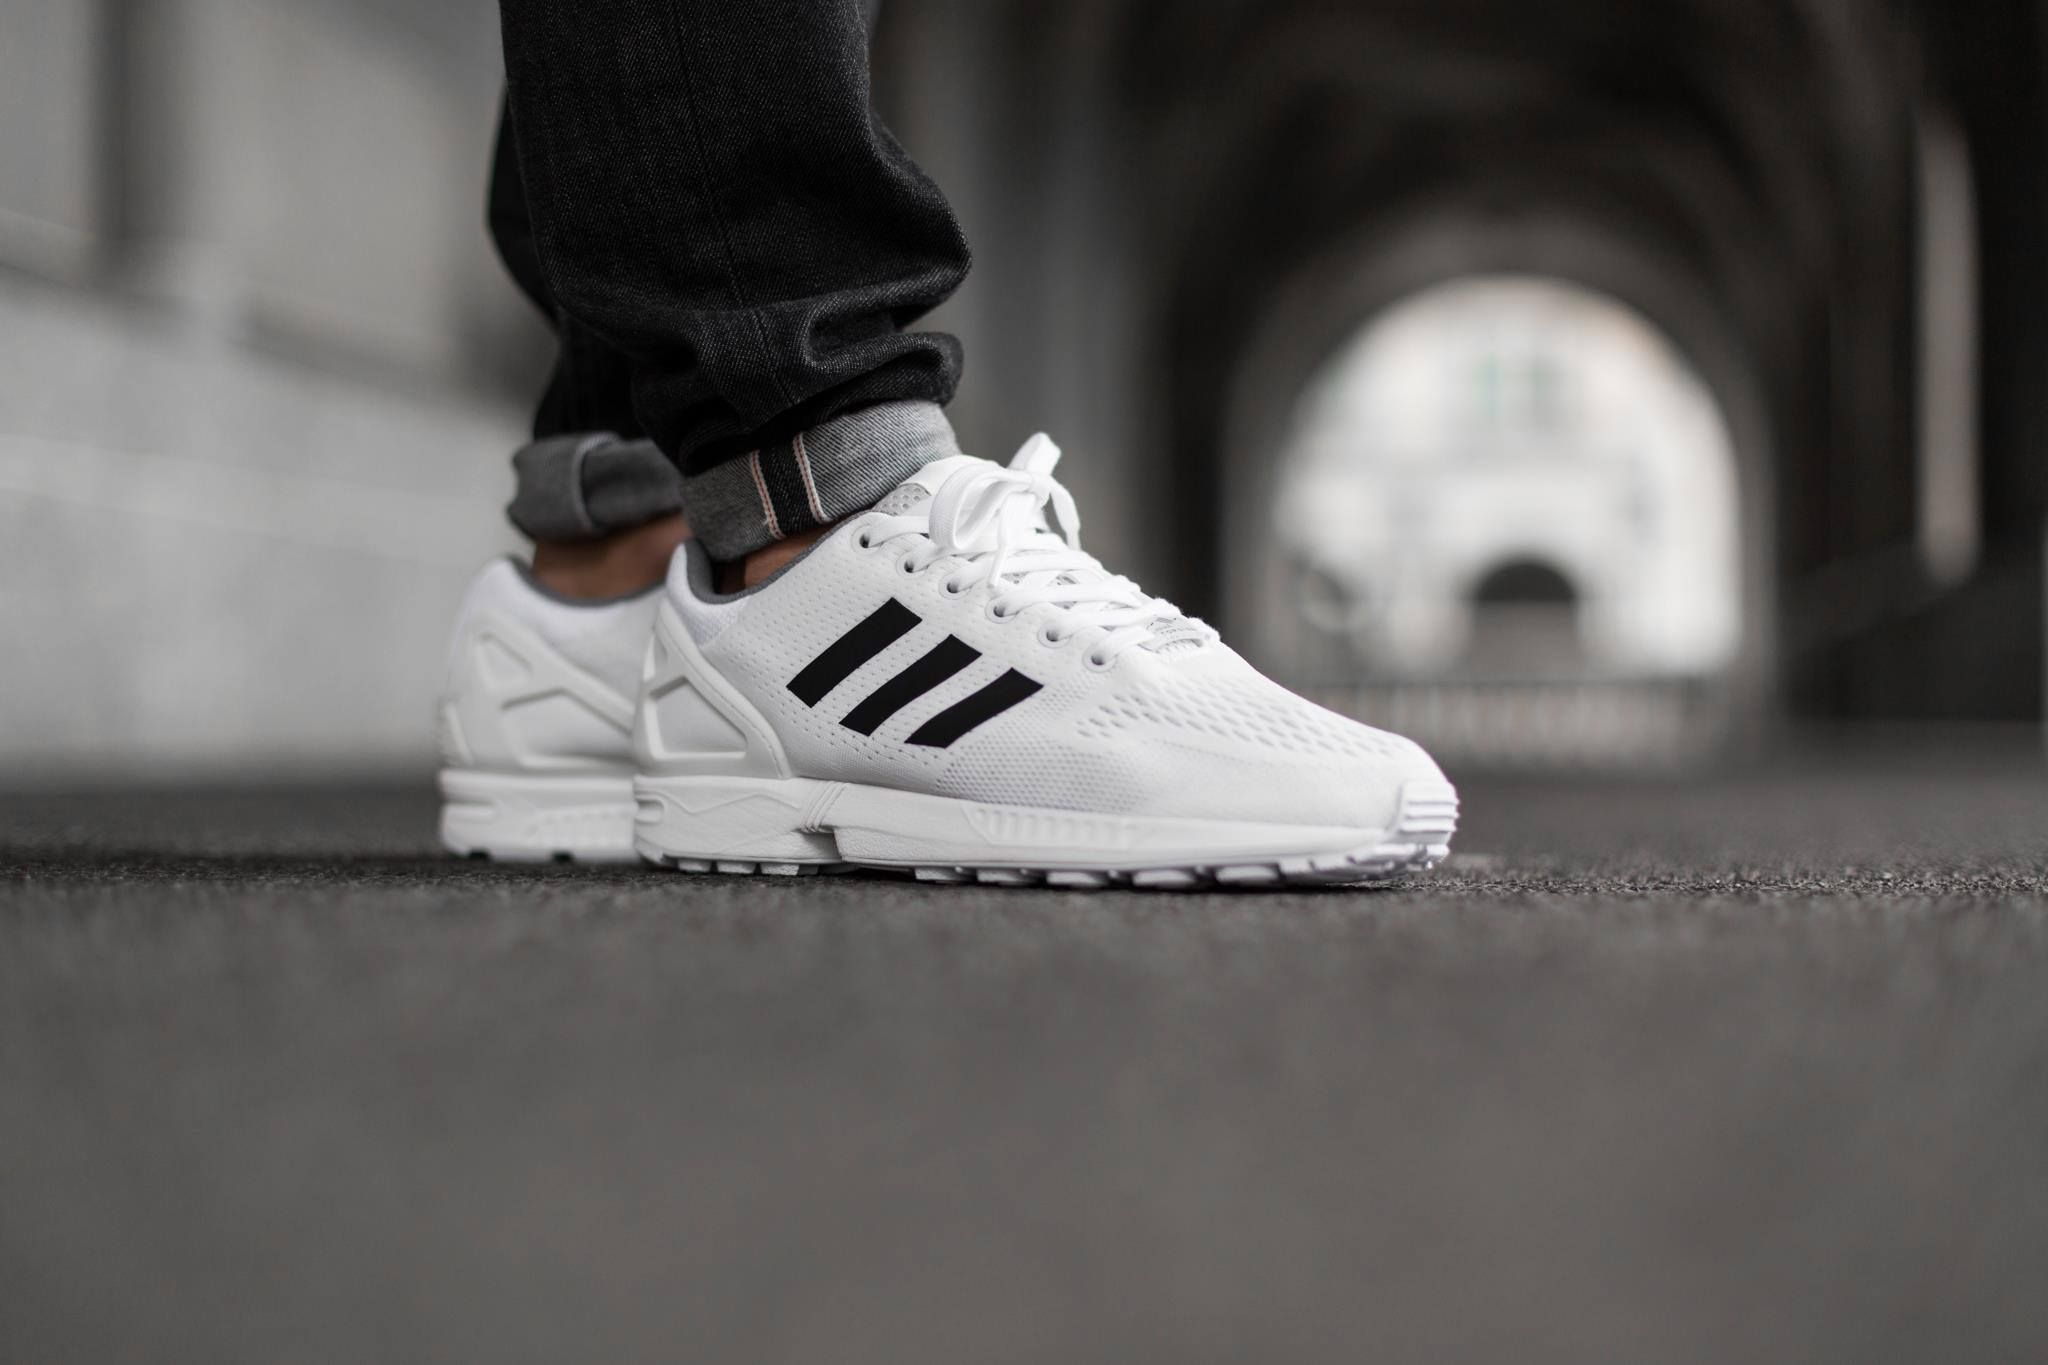 Adidas Zx Flux White Core Black Adidas Zx Flux White Sneakers Men Fashion Adidas Zx